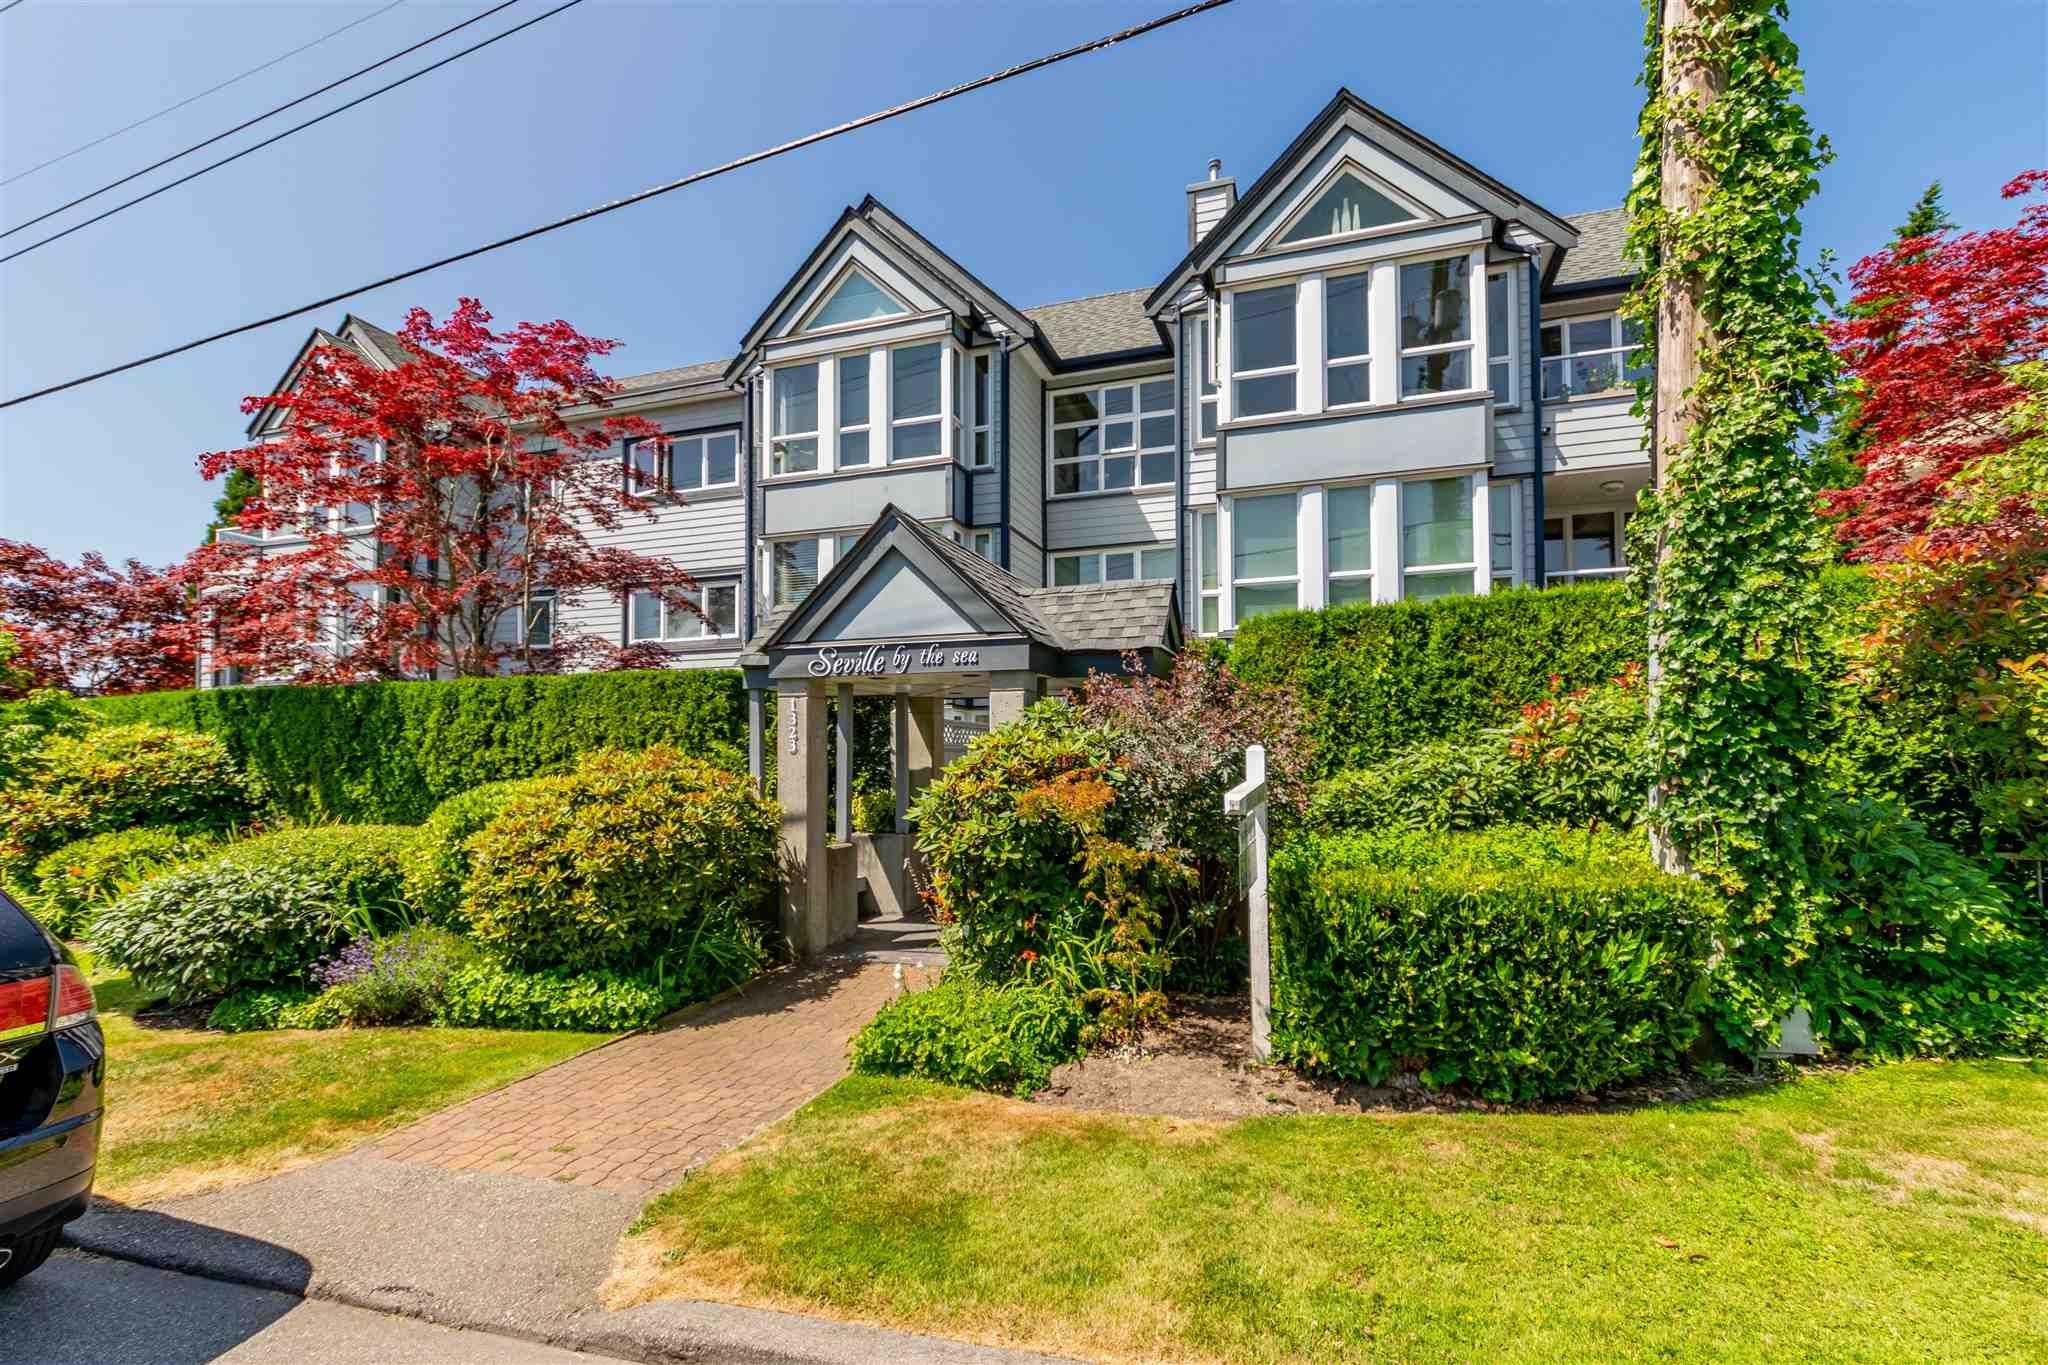 "Main Photo: 301 1323 MERKLIN Street: White Rock Condo for sale in ""SEVILLE BY THE SEA"" (South Surrey White Rock)  : MLS®# R2602198"